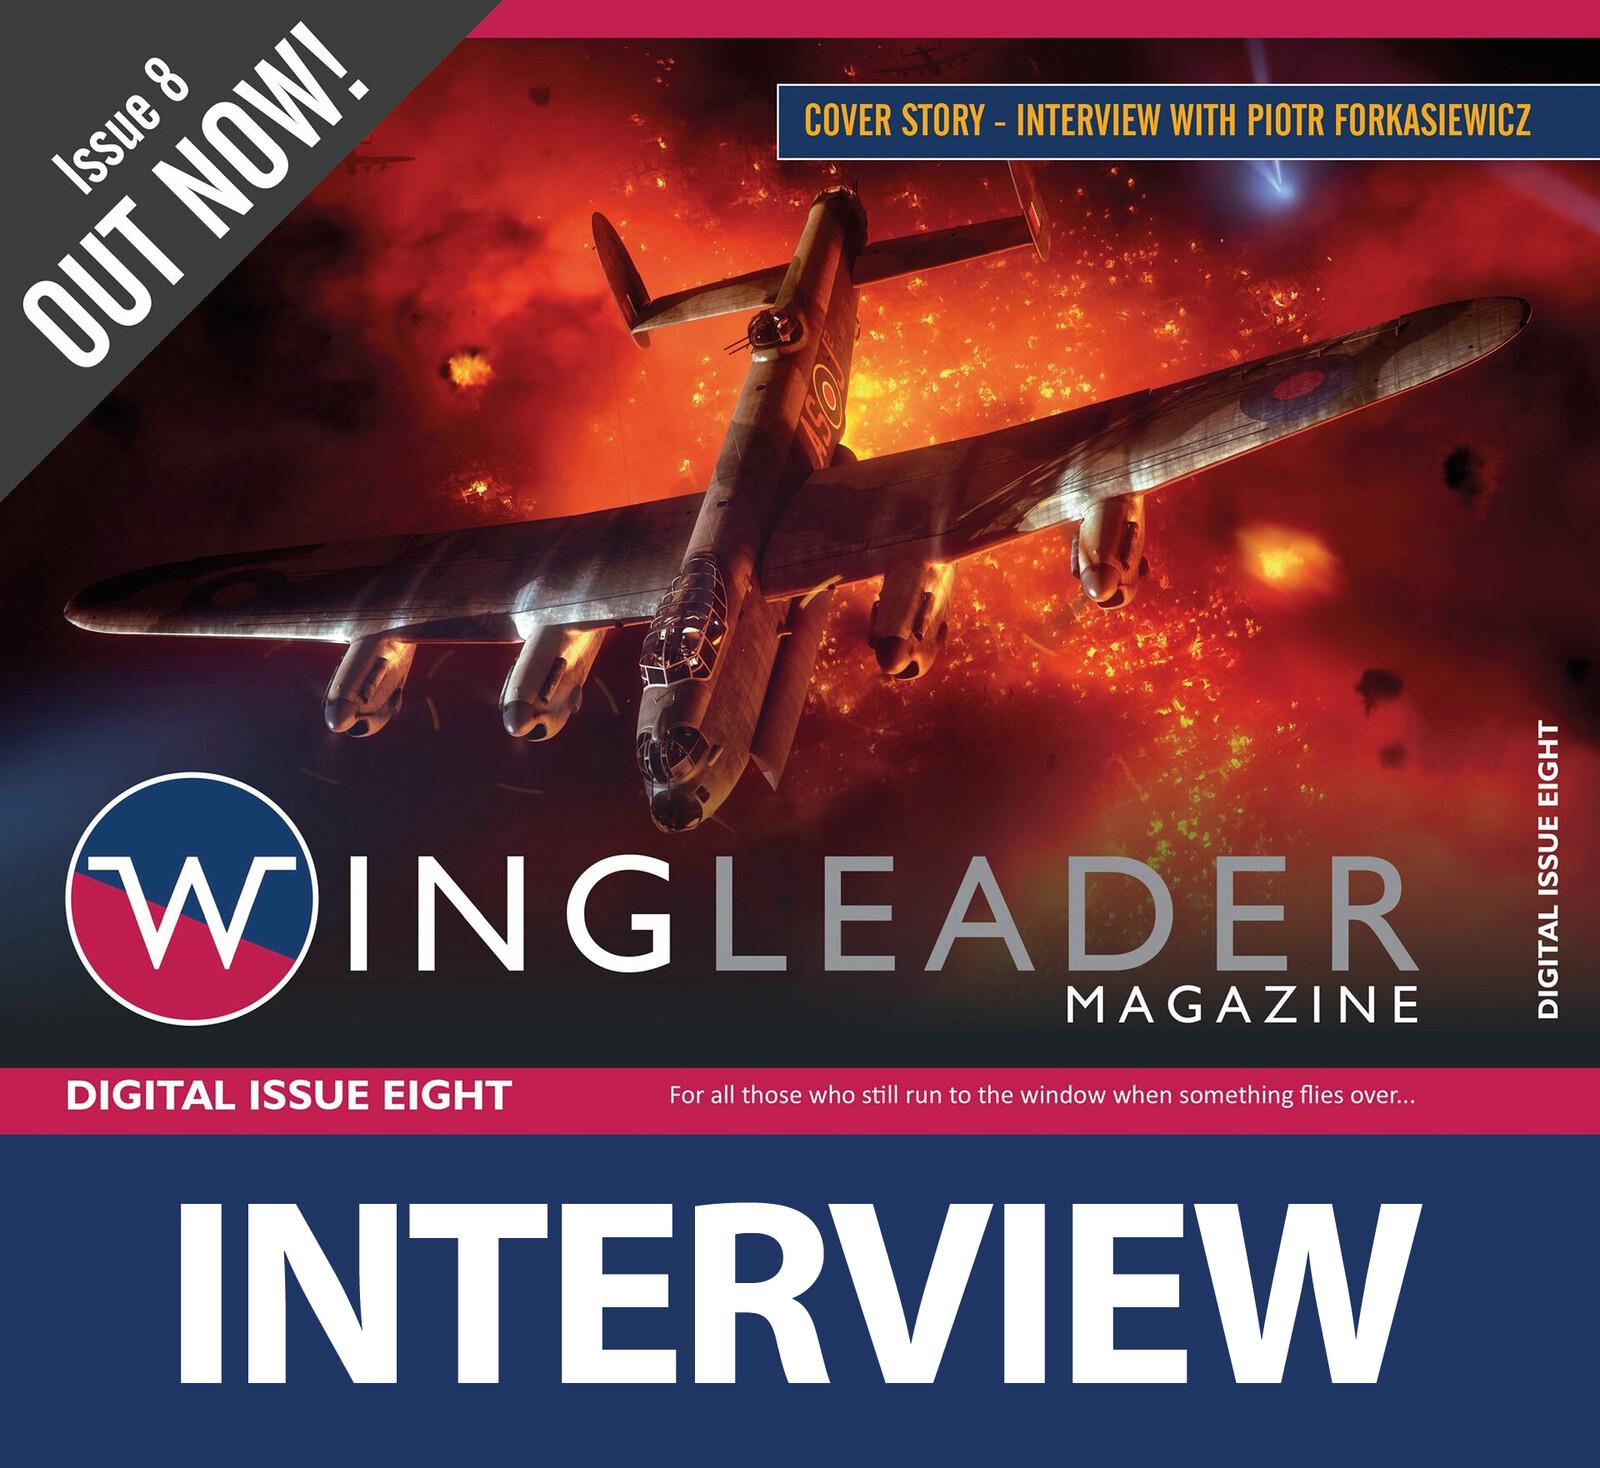 https://issuu.com/wingleader/docs/wingleader_magazine_-_issue_8_-_digital_edition